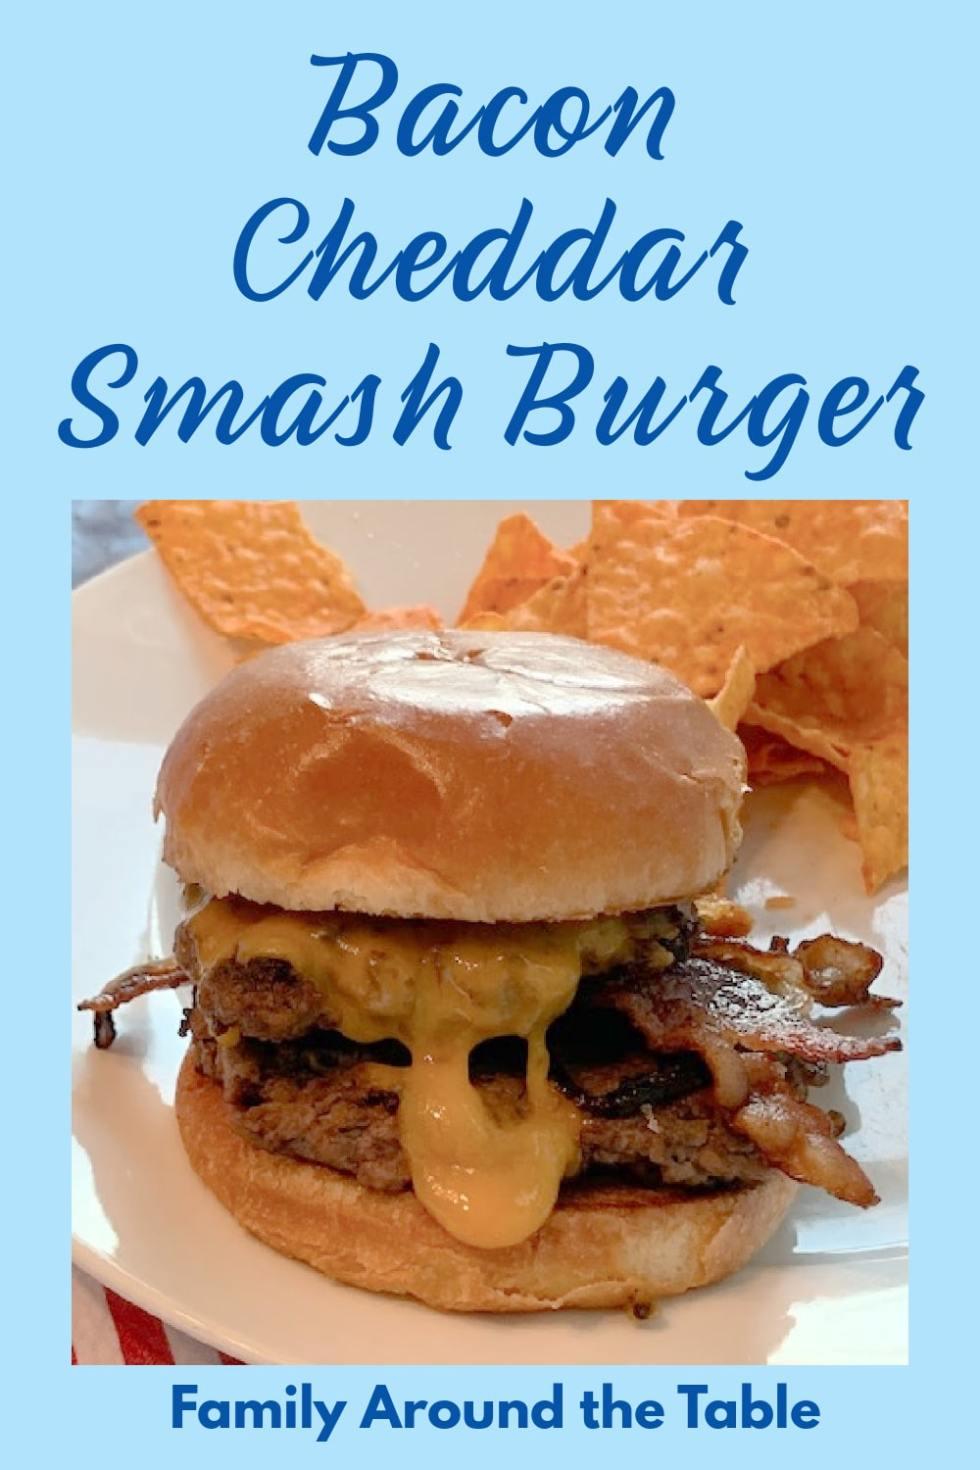 Bacon Cheddar Smash Burger Pinterest Image